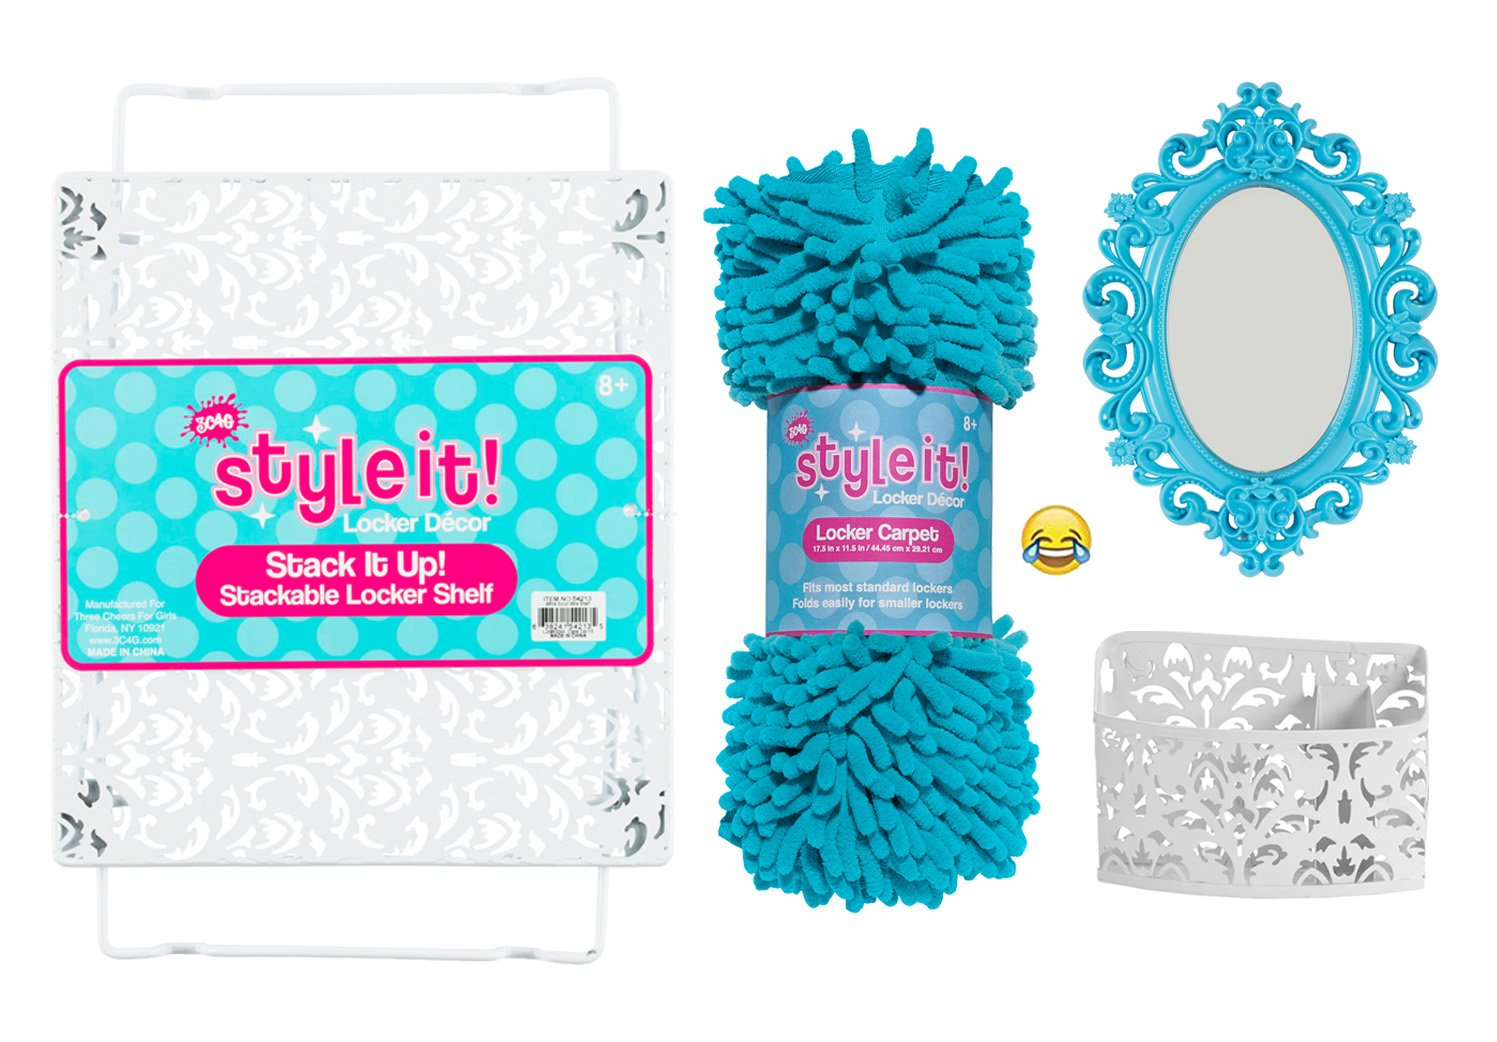 Luxe School Locker Organizer Kit - Accessories and Decoration Set with Shelf, Rug, Mirror and Bin (Aqua)